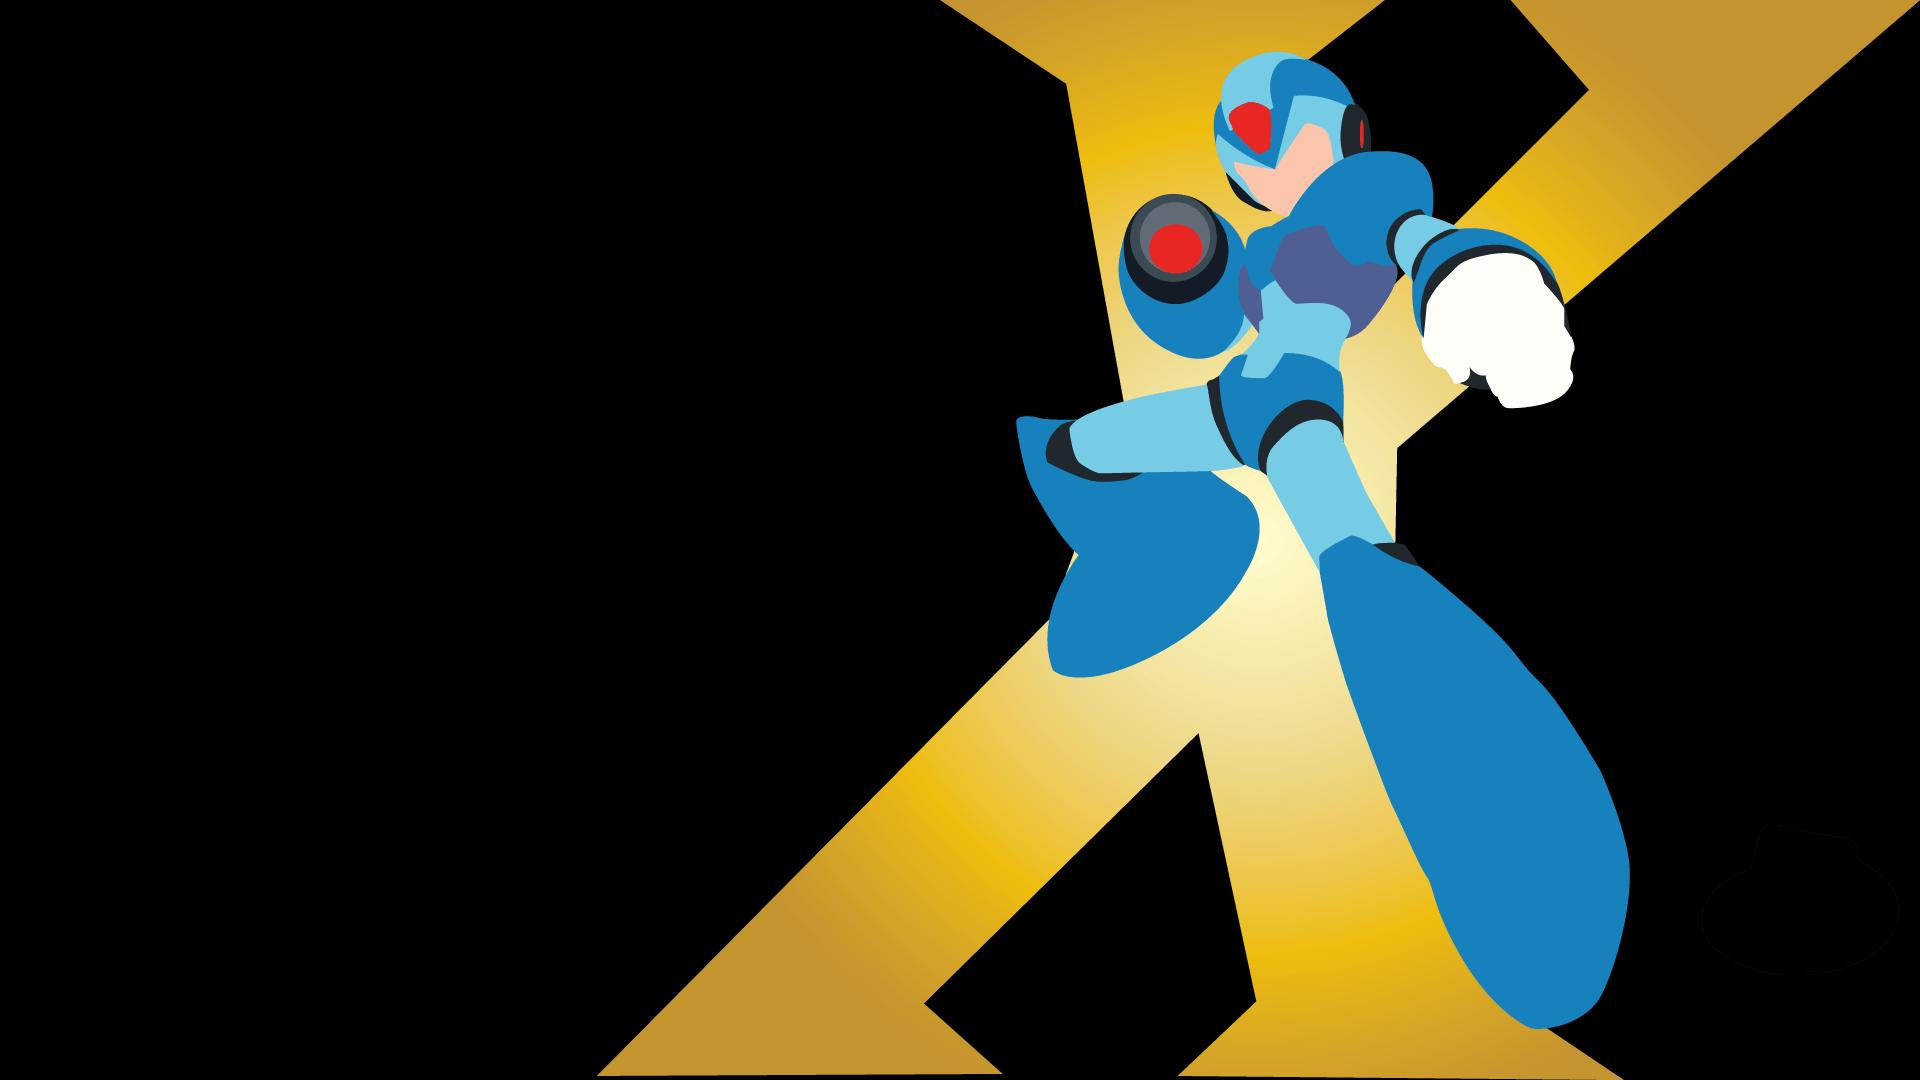 Megaman X Wallpapers